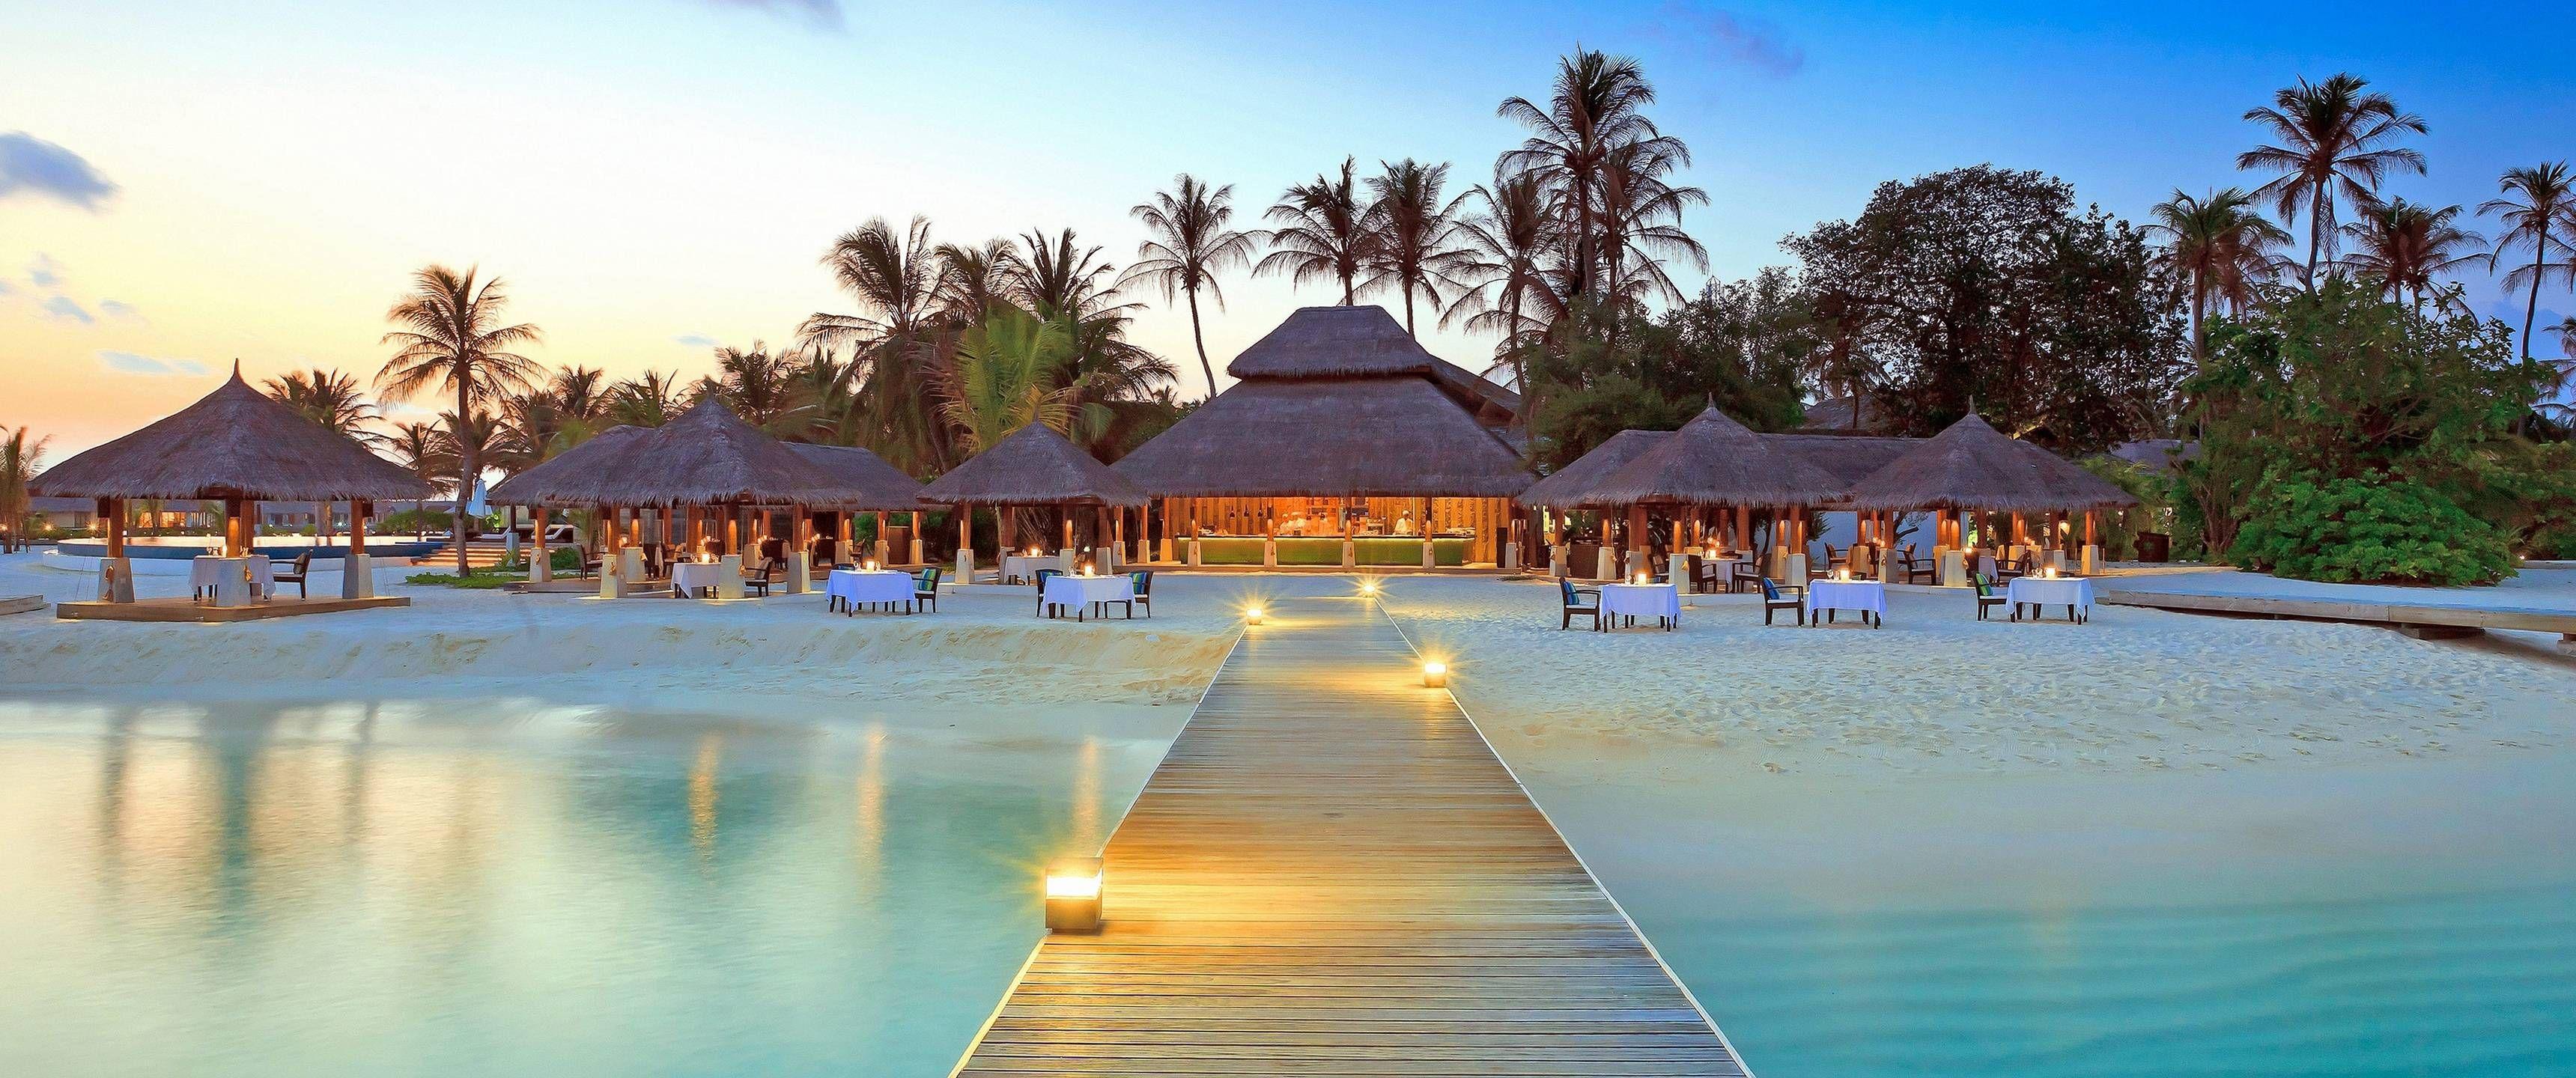 3440x1440 Tent House wallpaper Vacation, Maldives resort